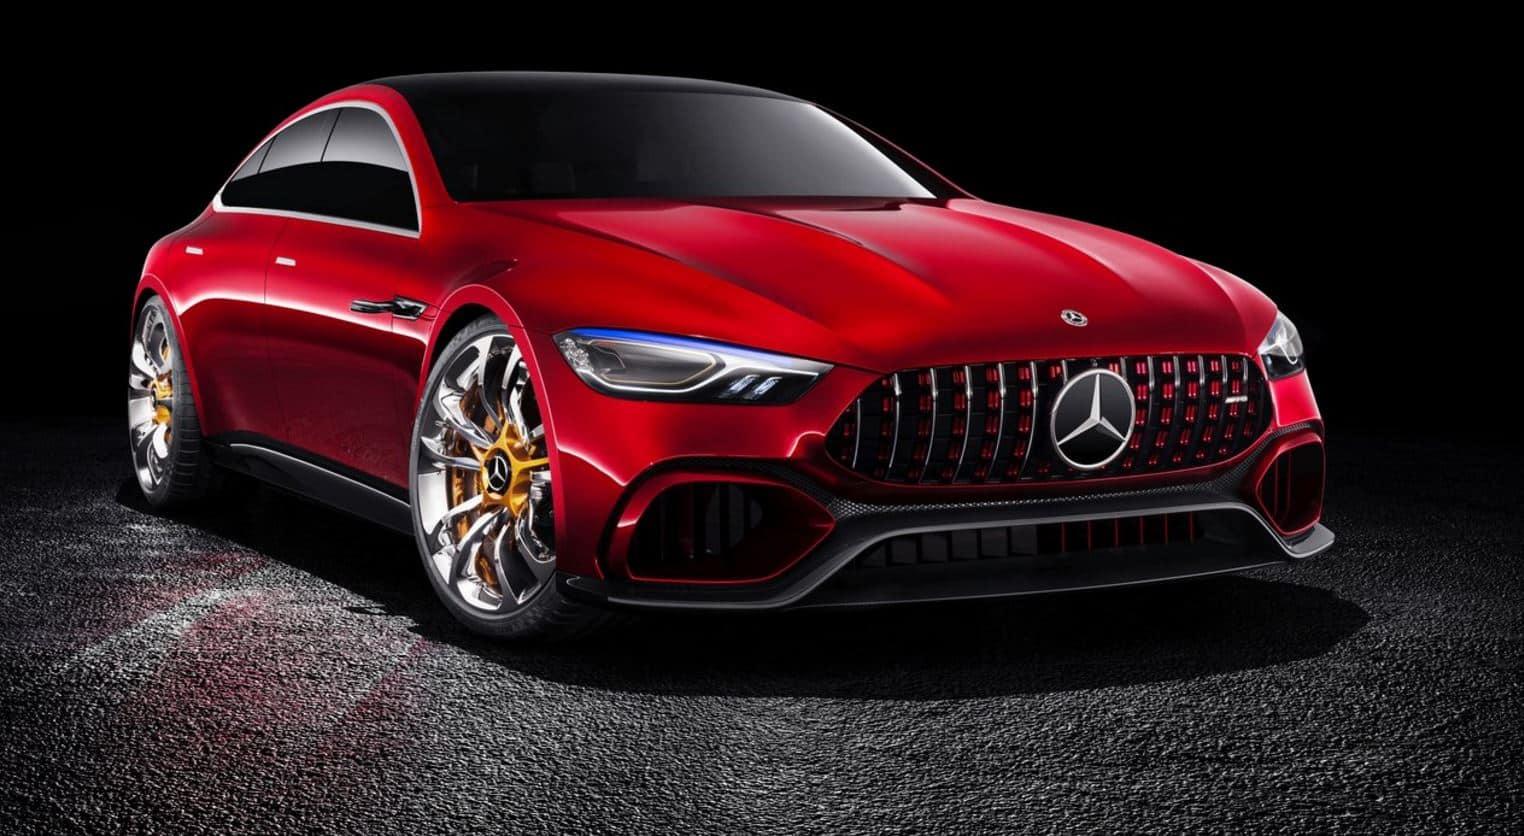 Mercedes Benz AMG GT Concept 9